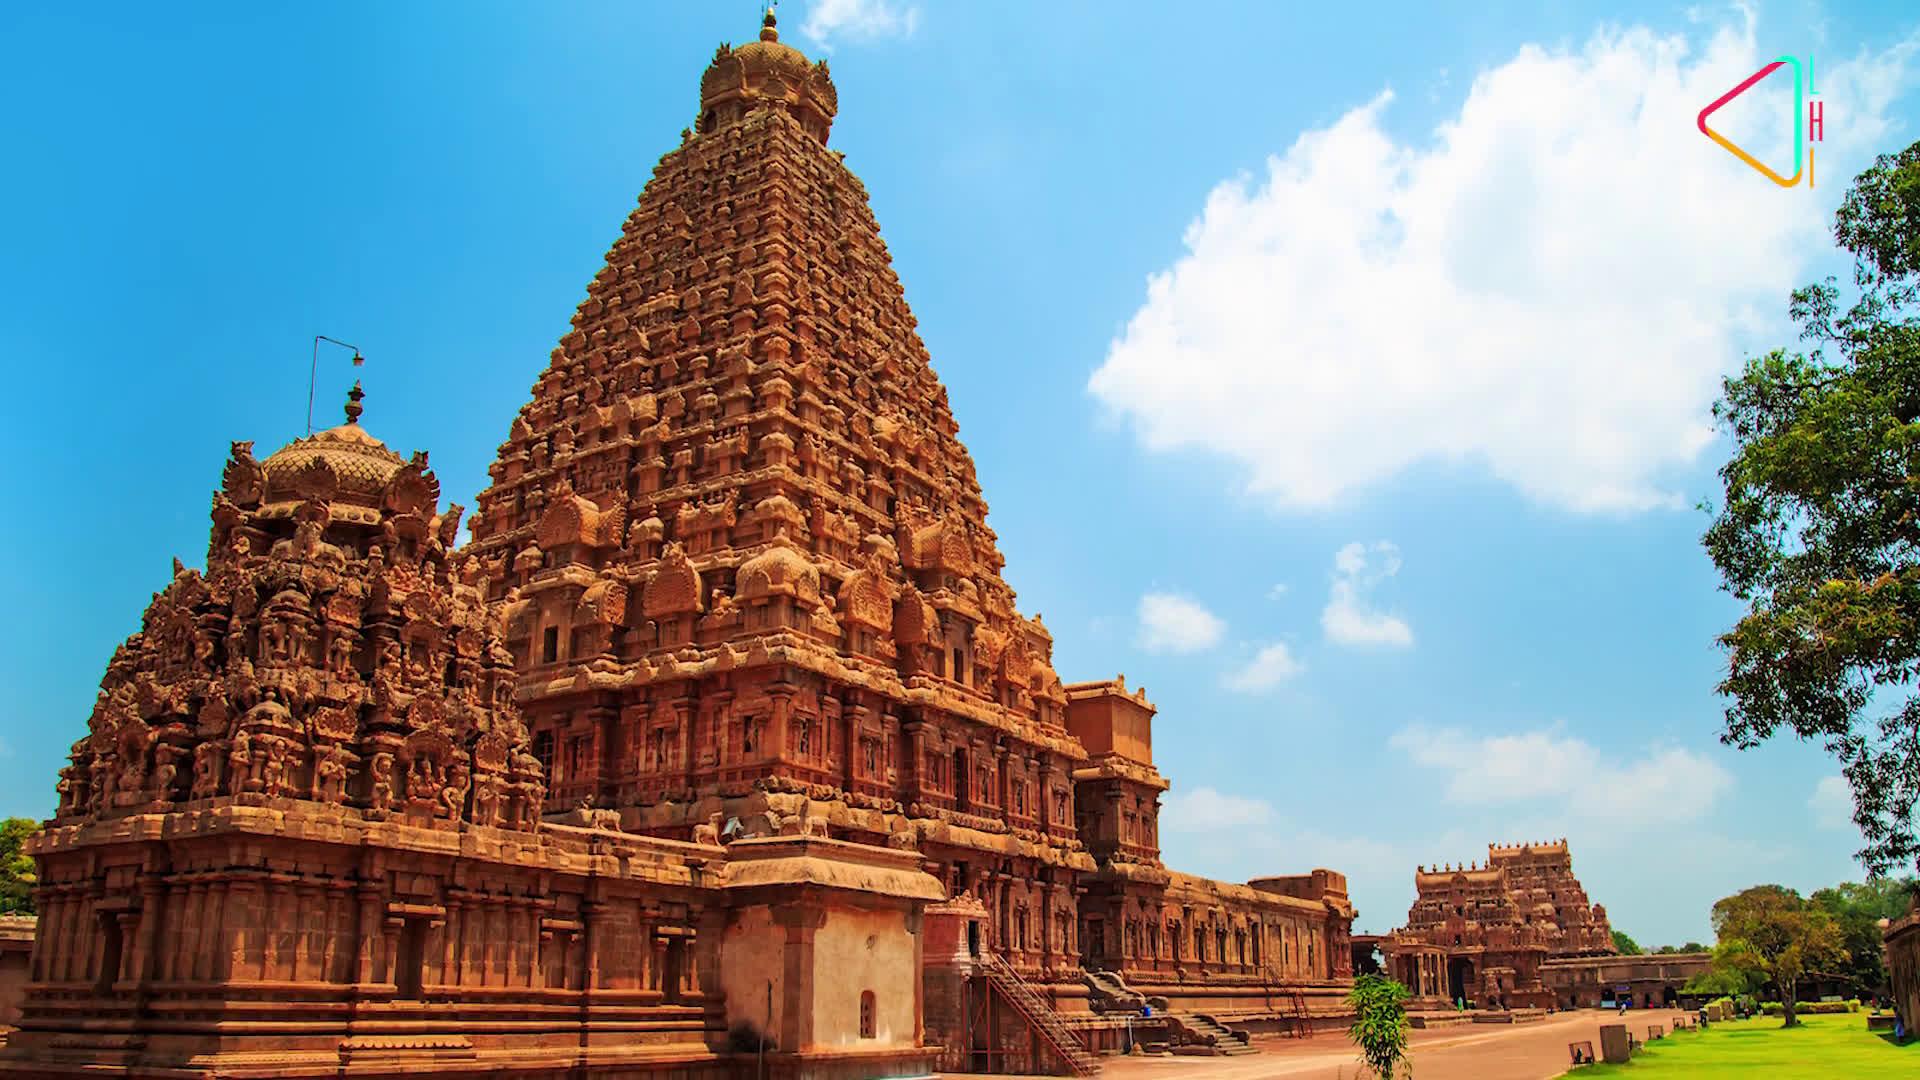 Brihadisvara Temple: A King's Glory in Stone